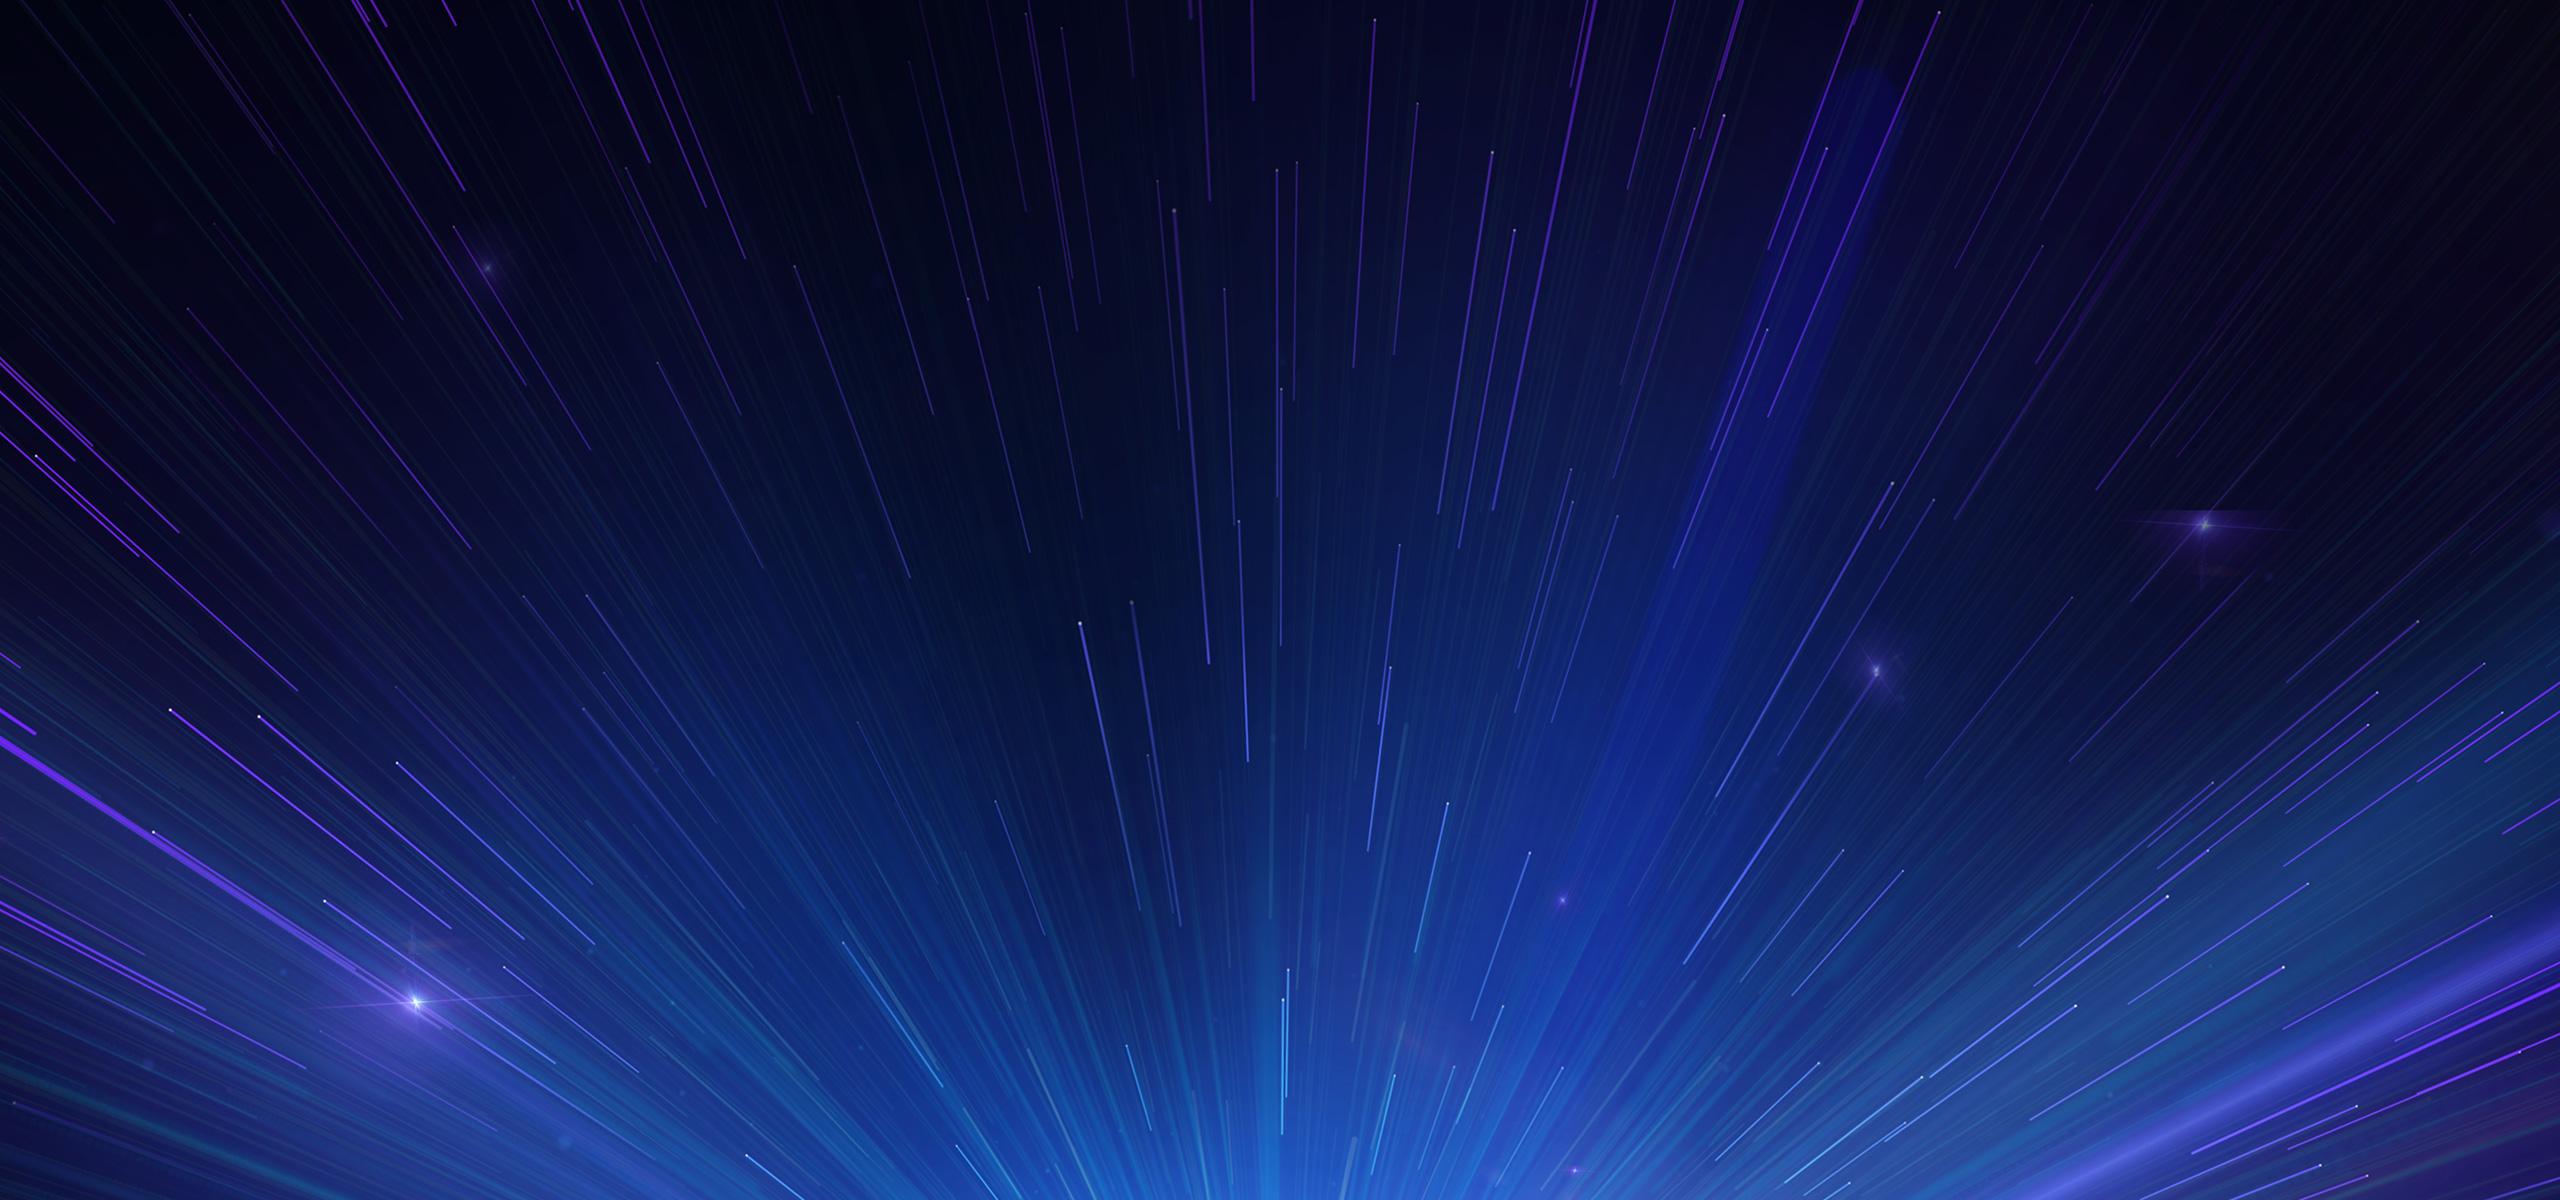 mi laser projector 150 xiaomi united states